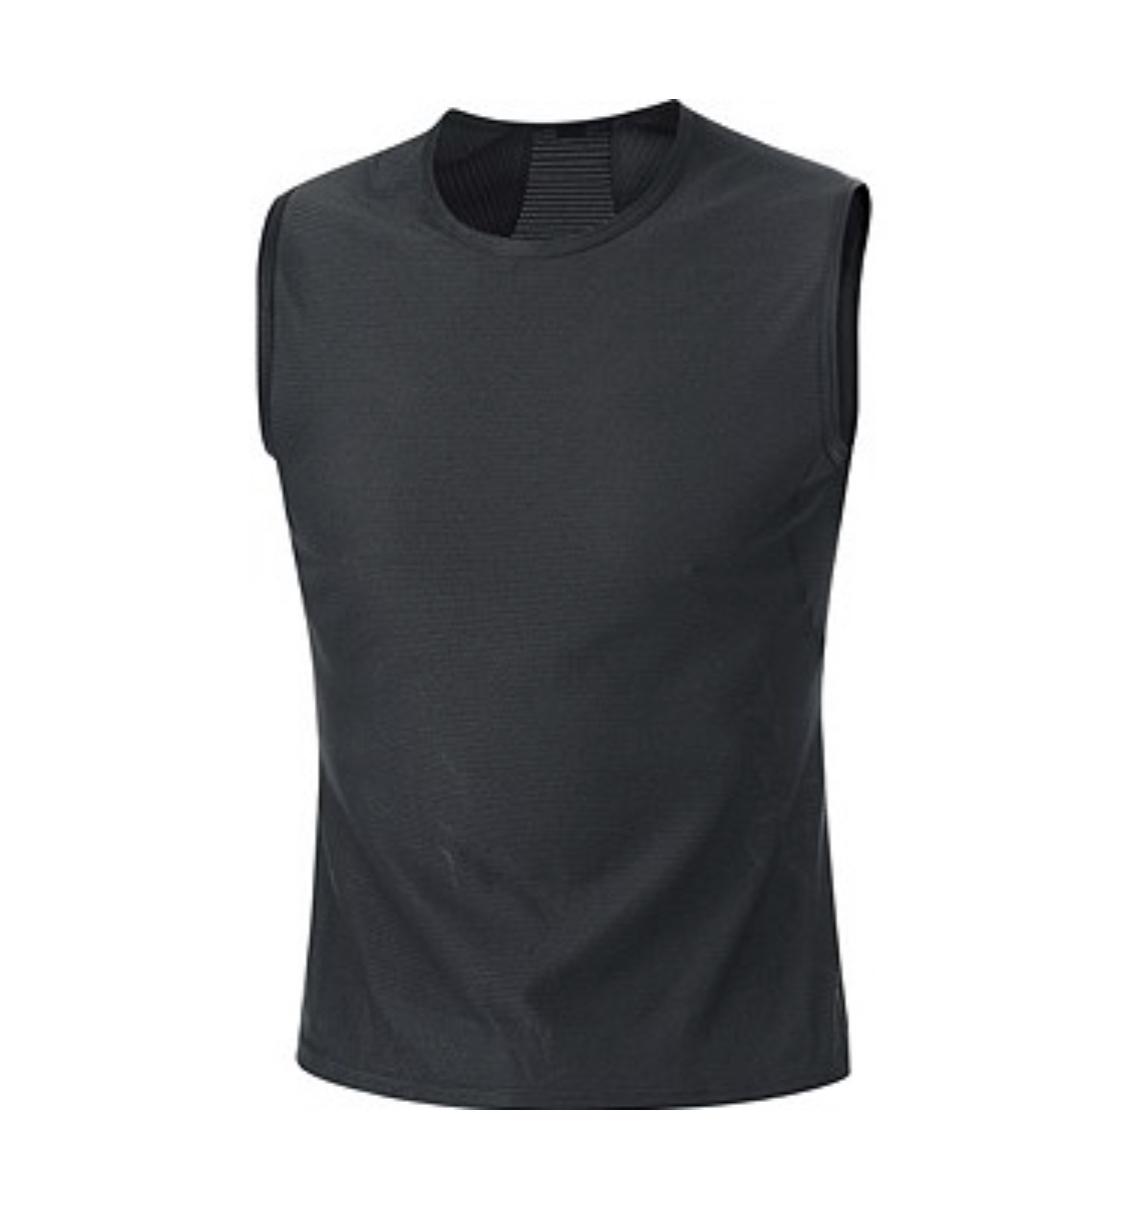 GORE® M Base Layer Sleeveless Shirt